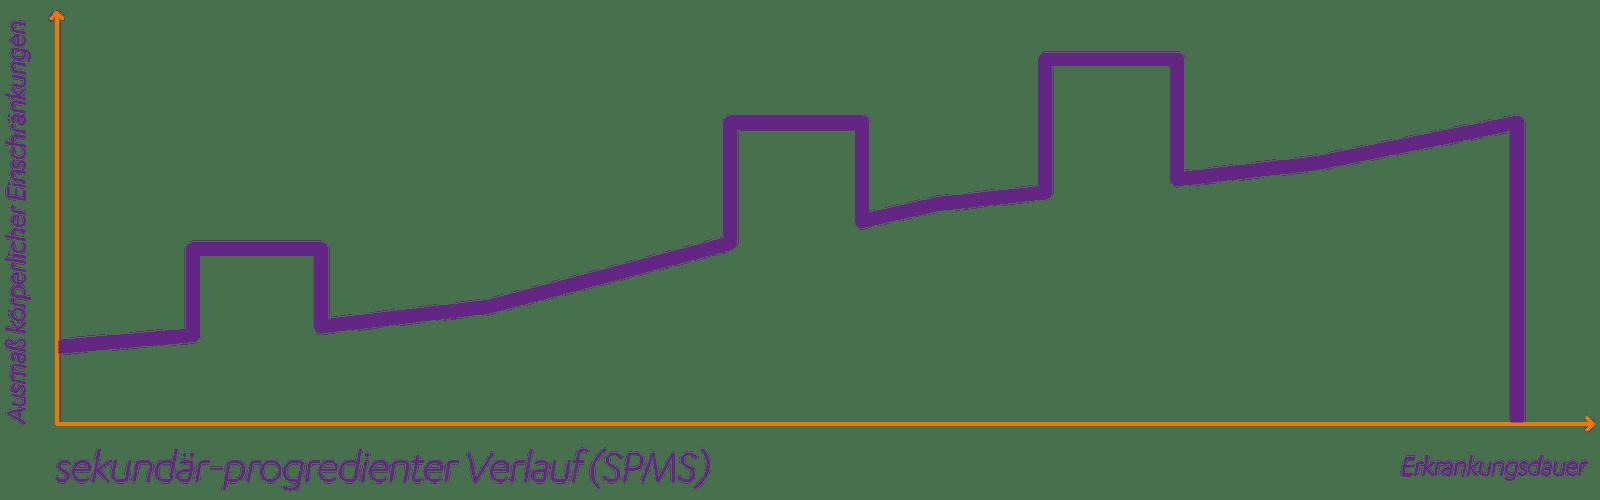 Sekundär progrediente Multiple Sklerose